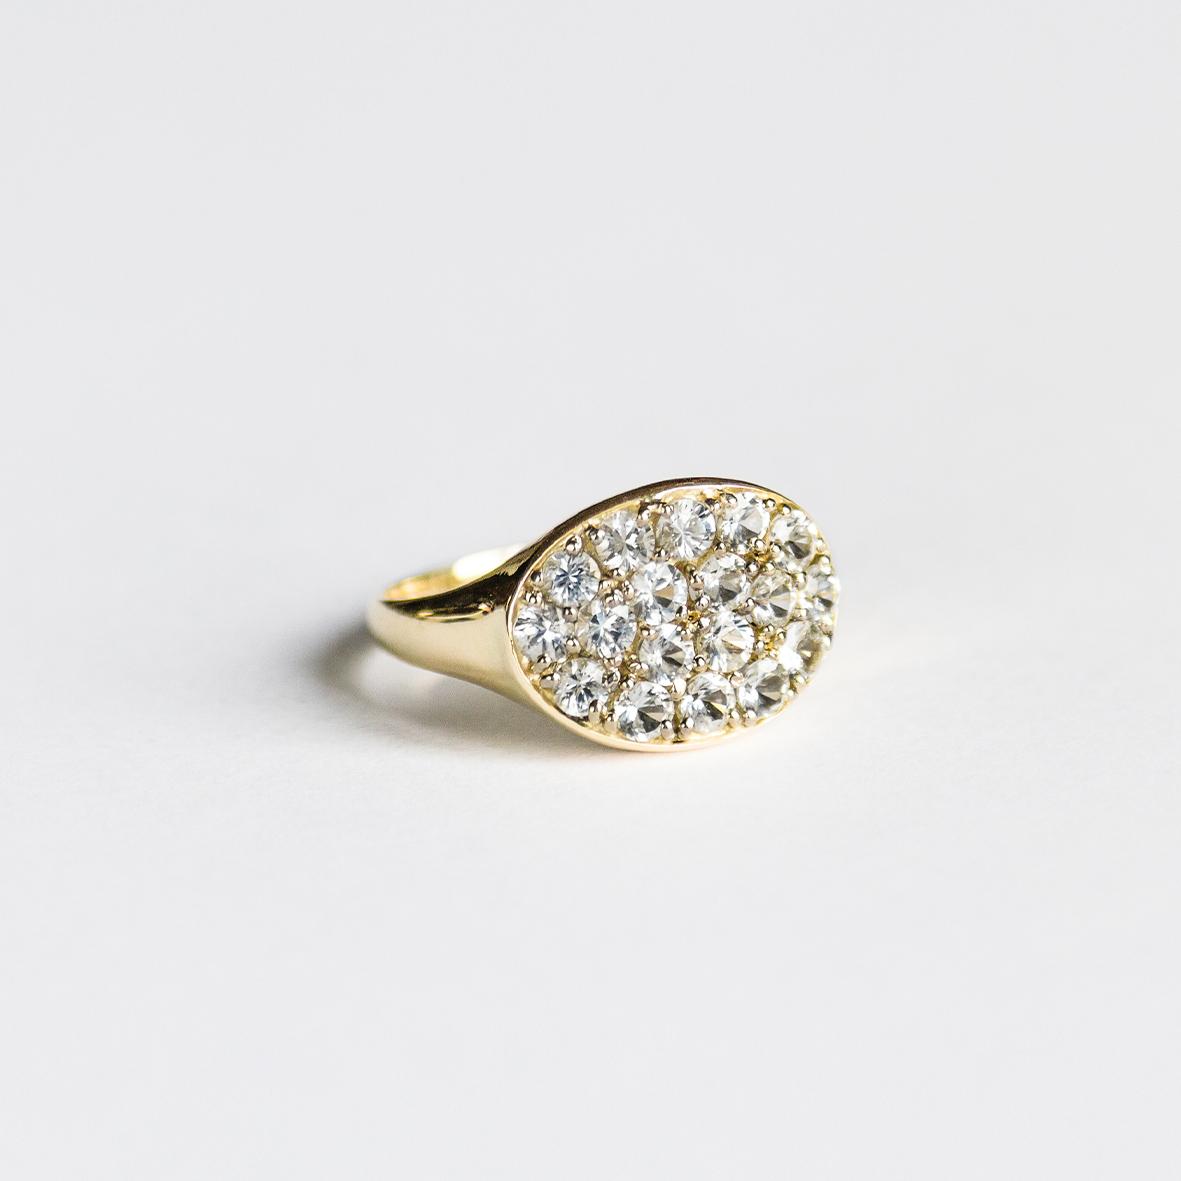 1. OONA_lotus_ficha2_signet horizontal sapphire ring